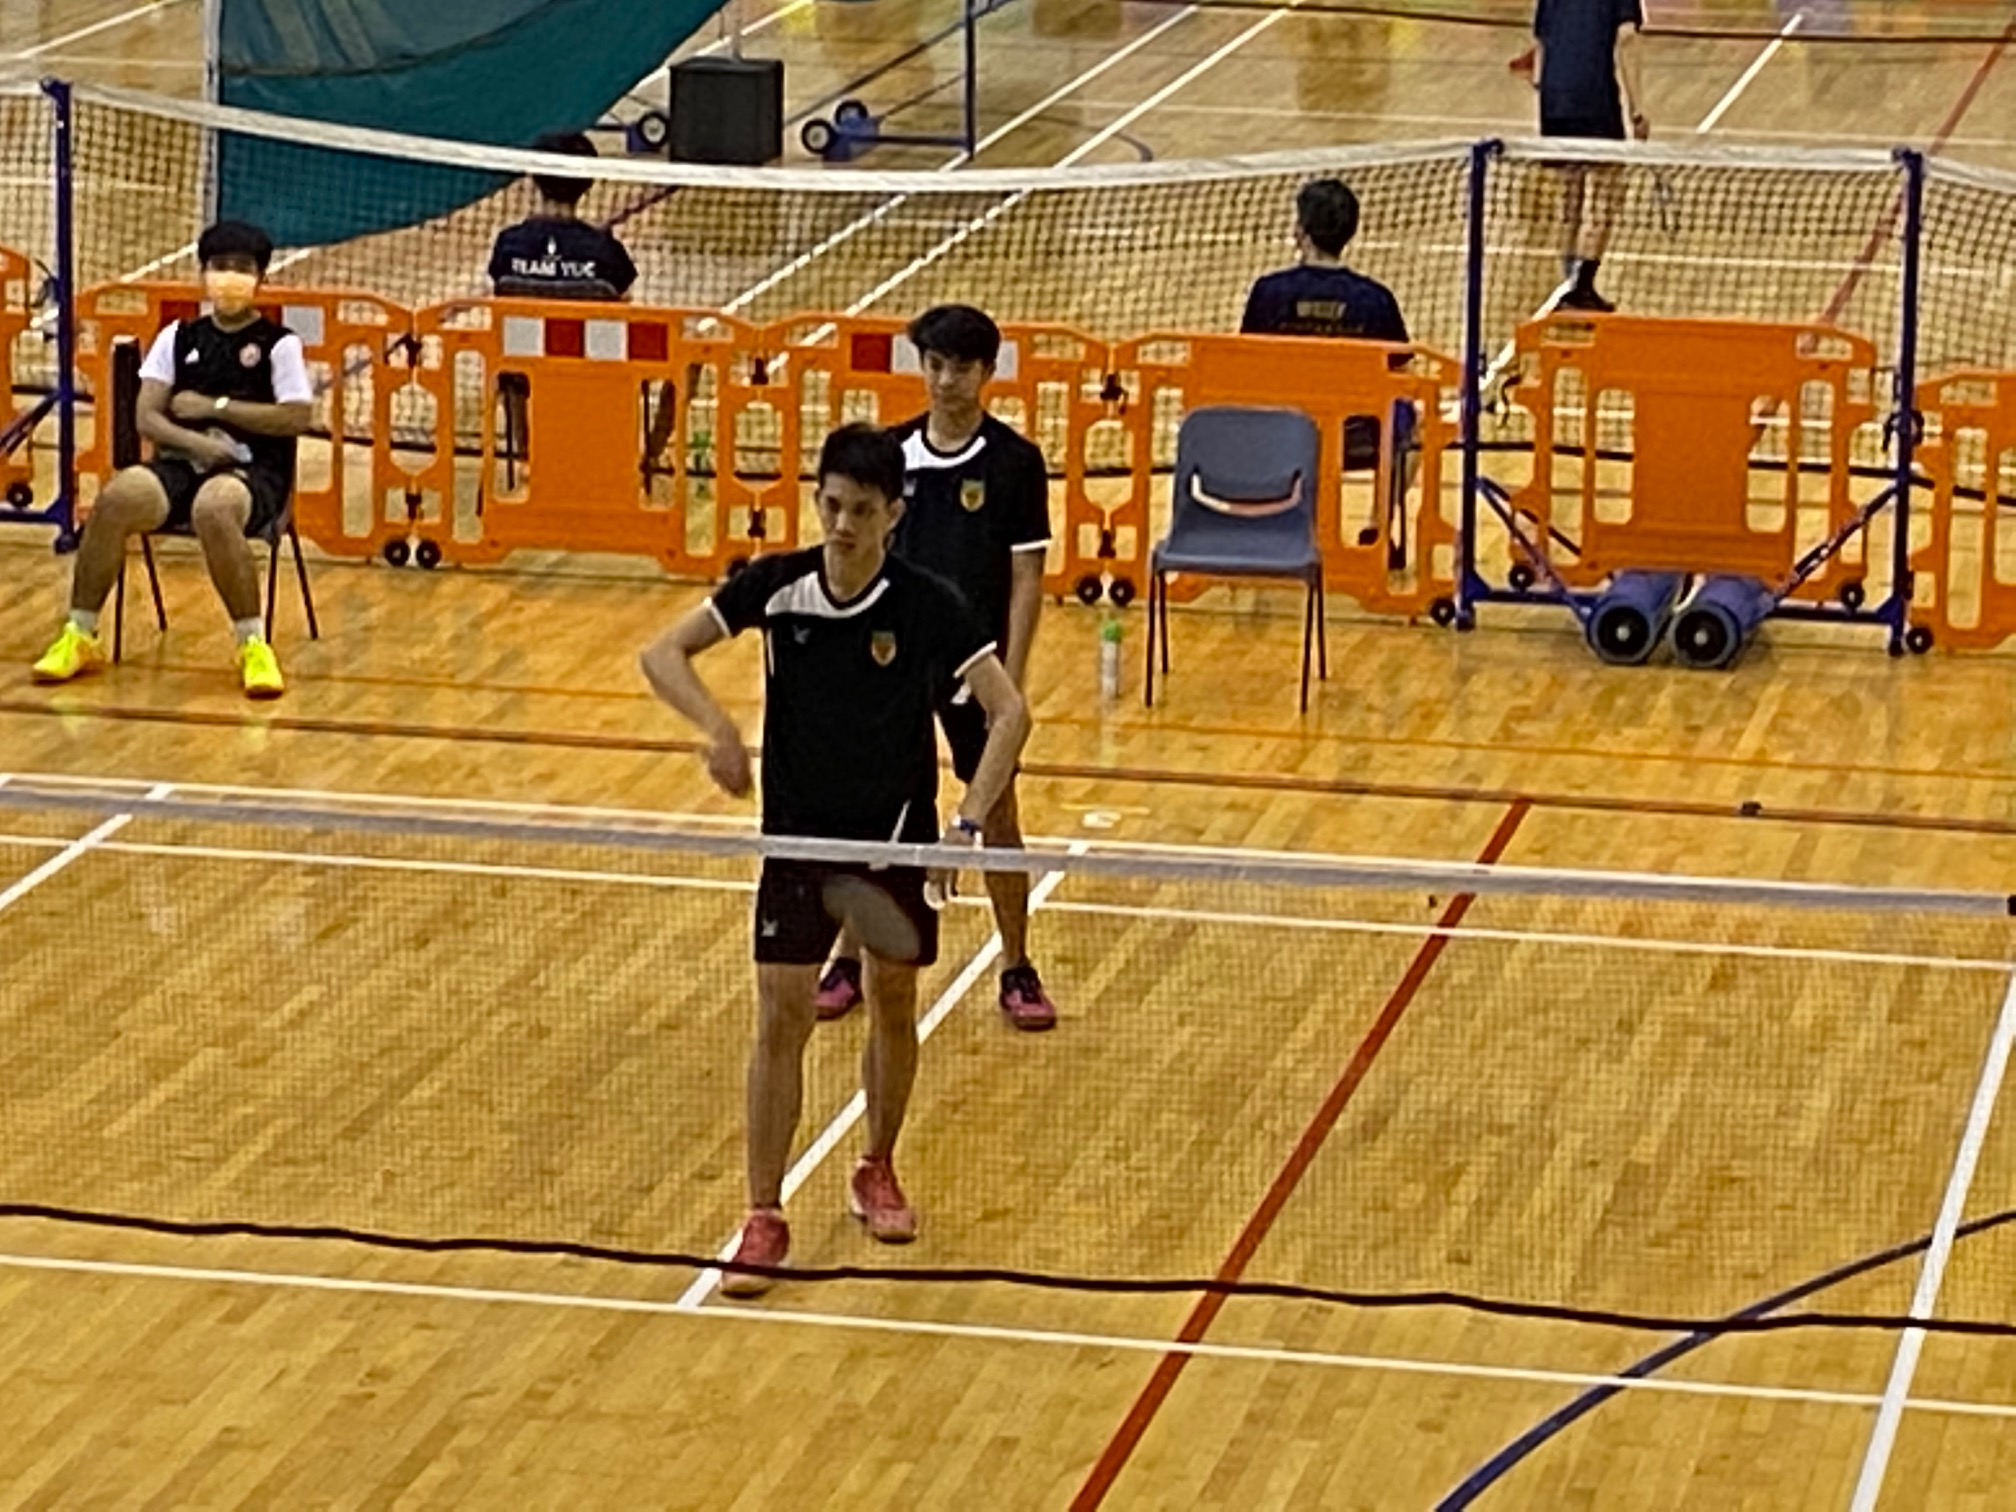 NSG A Div boys badminton - RI vs VJC second doubles RI duo